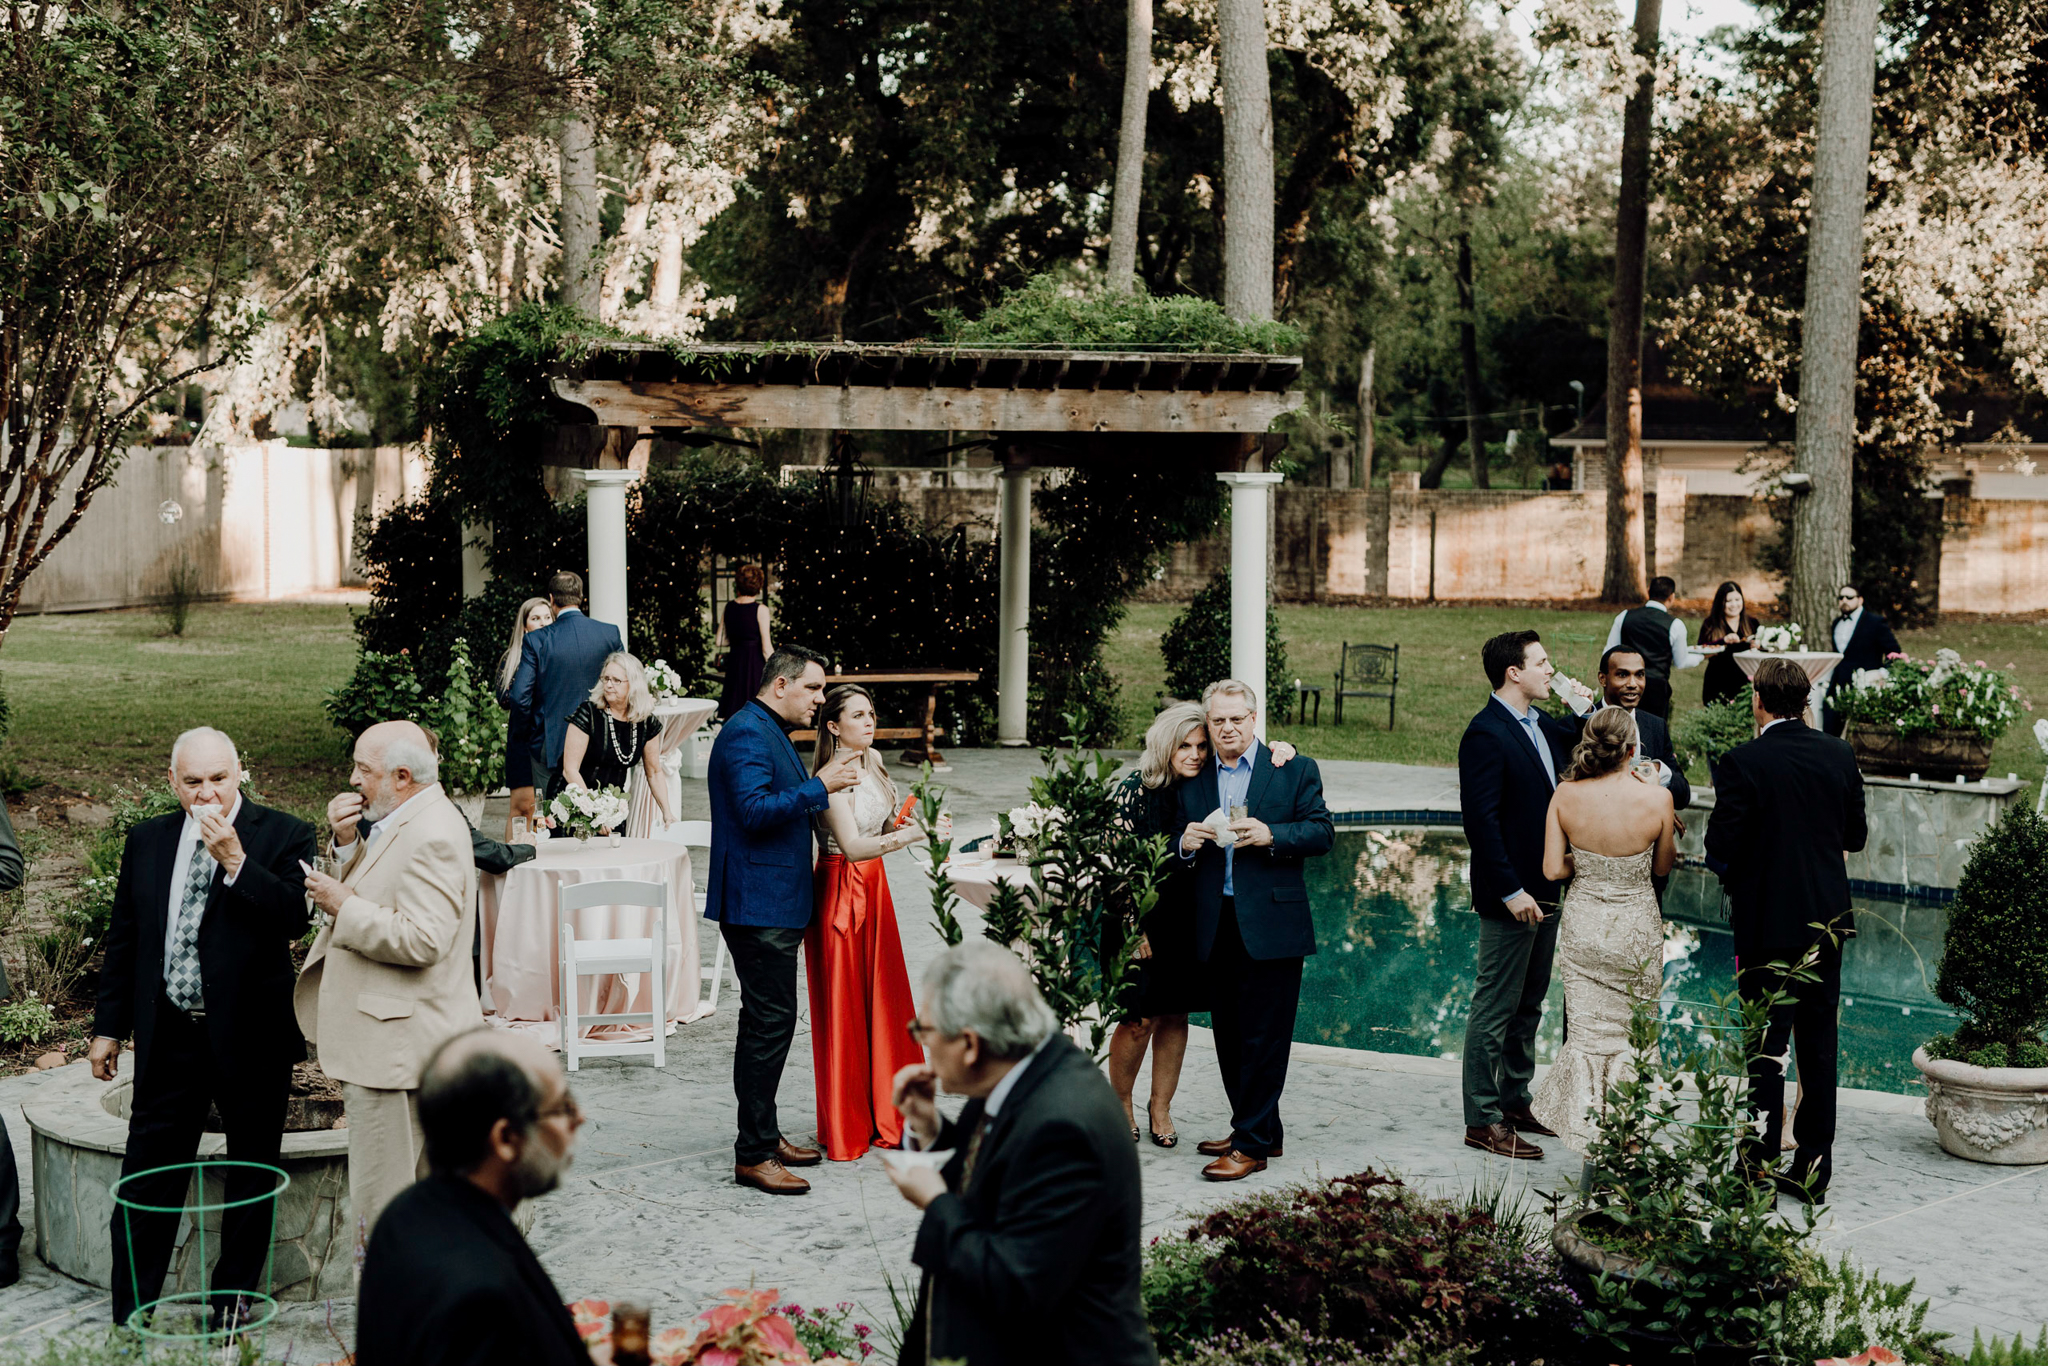 Houston Wedding Photographer-Intimate Texas Backyard Wedding- Houston Wedding Photographer -Kristen Giles Photography-50.jpg